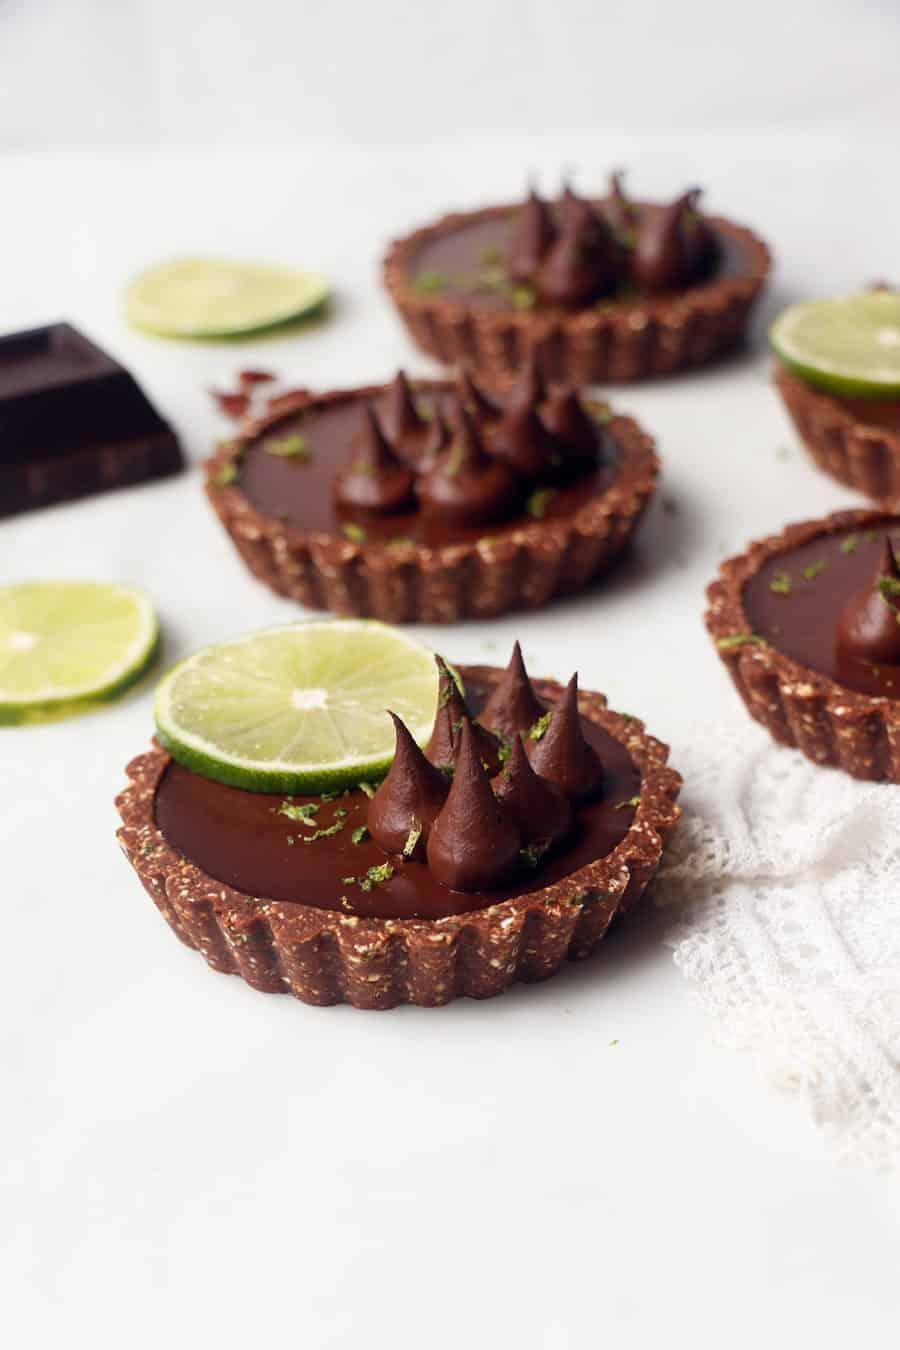 Chilli Lime Chocolate Tarts (vegan & gluten-free)